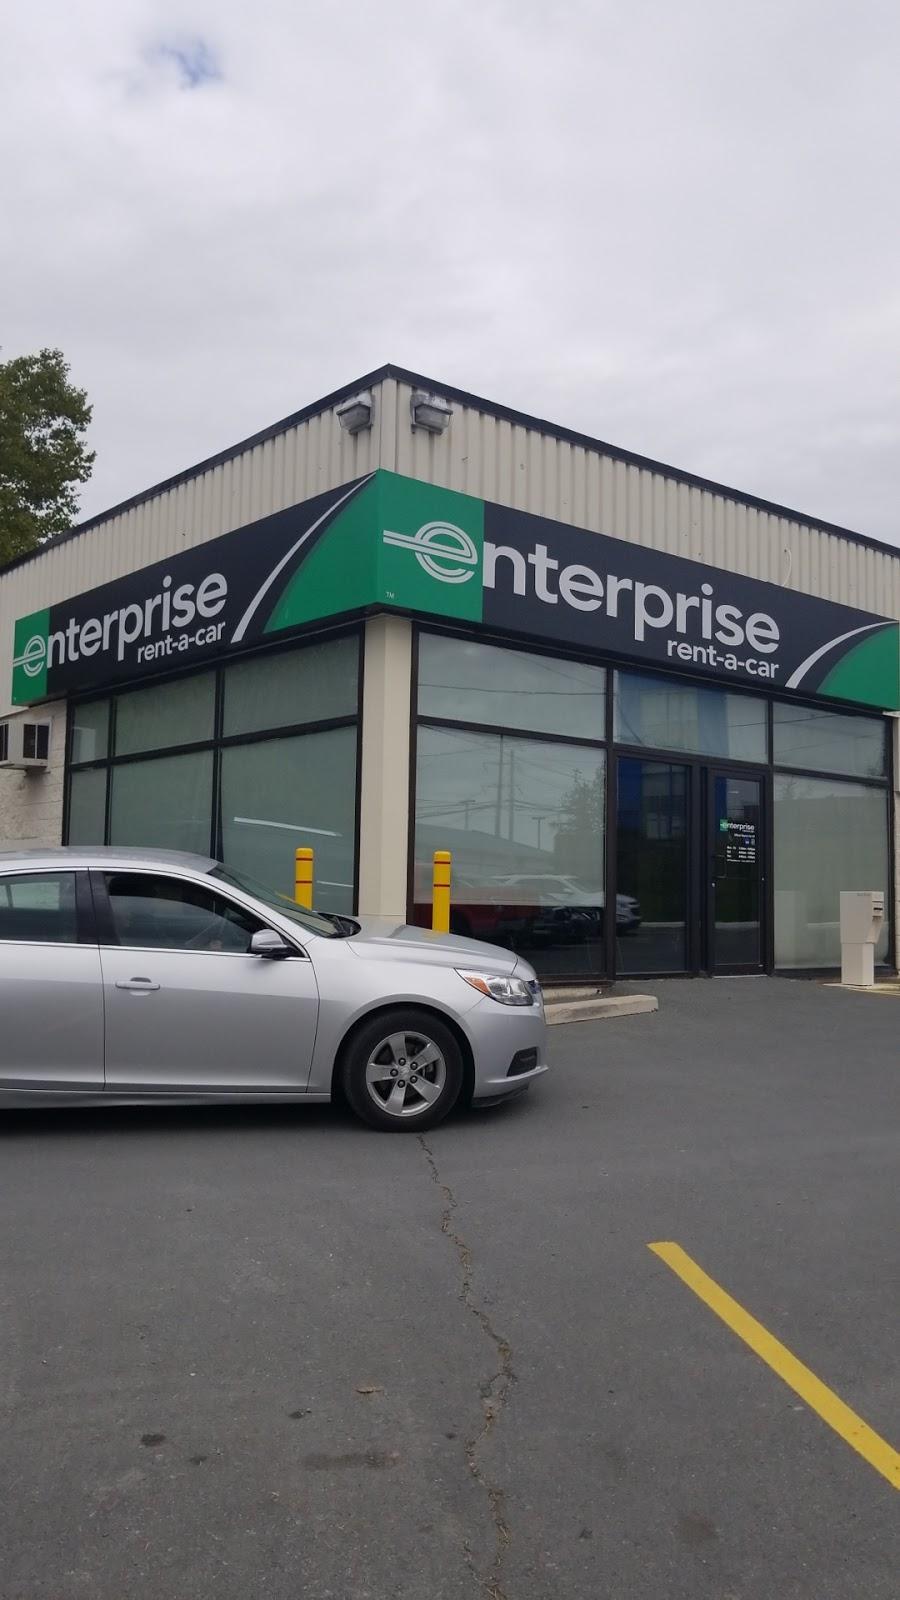 Enterprise Rent-A-Car | car rental | 3387 Kempt Rd, Halifax, NS B3K 4X5, Canada | 9024536929 OR +1 902-453-6929